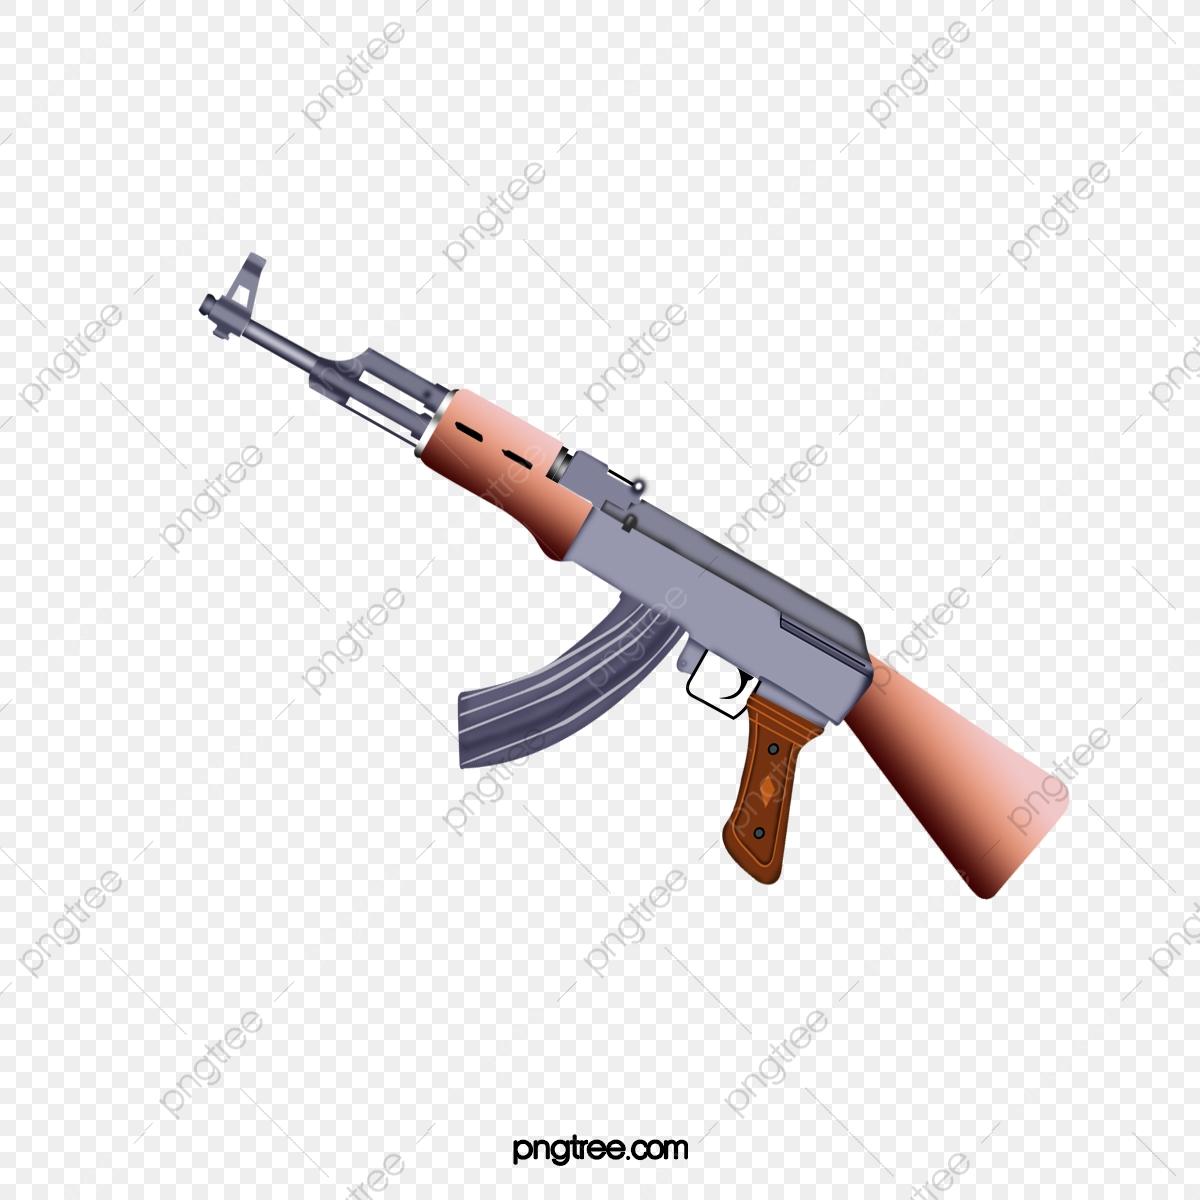 Ak47 Rifles, Arms, Firearms, Ak47 PNG Transparent Clipart Image and.